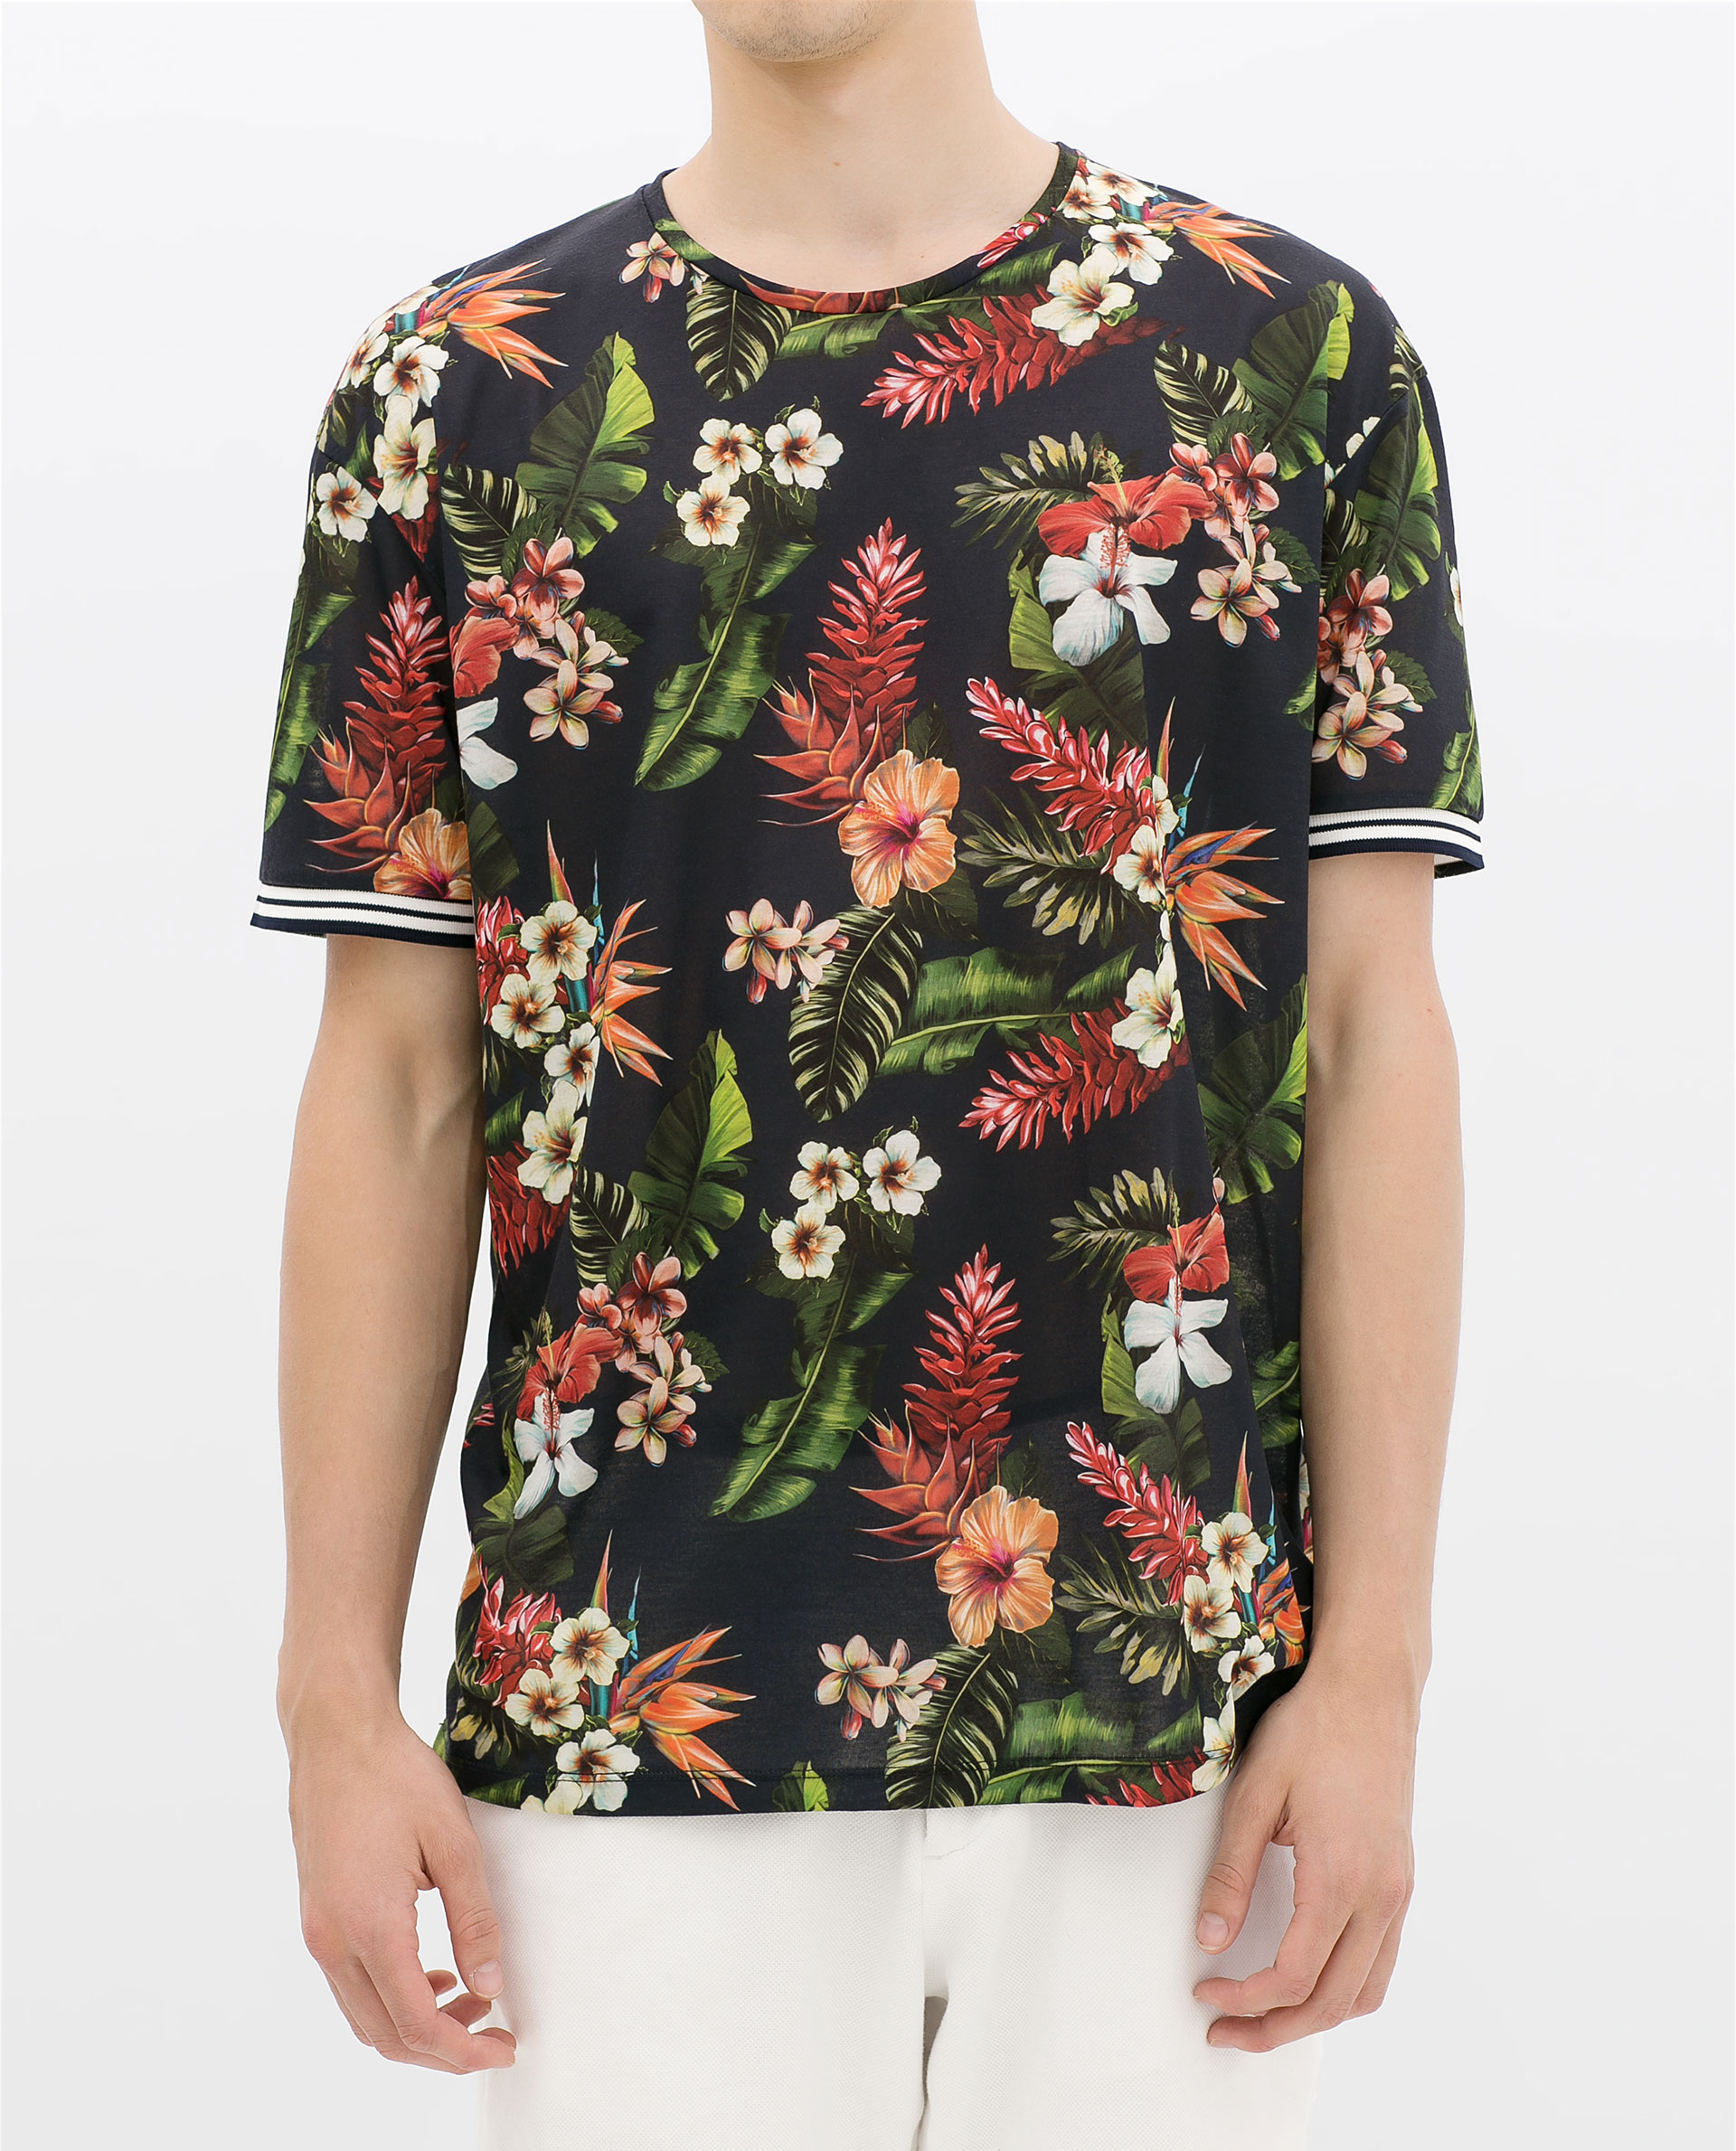 Cheap V Neck T Shirts For Men